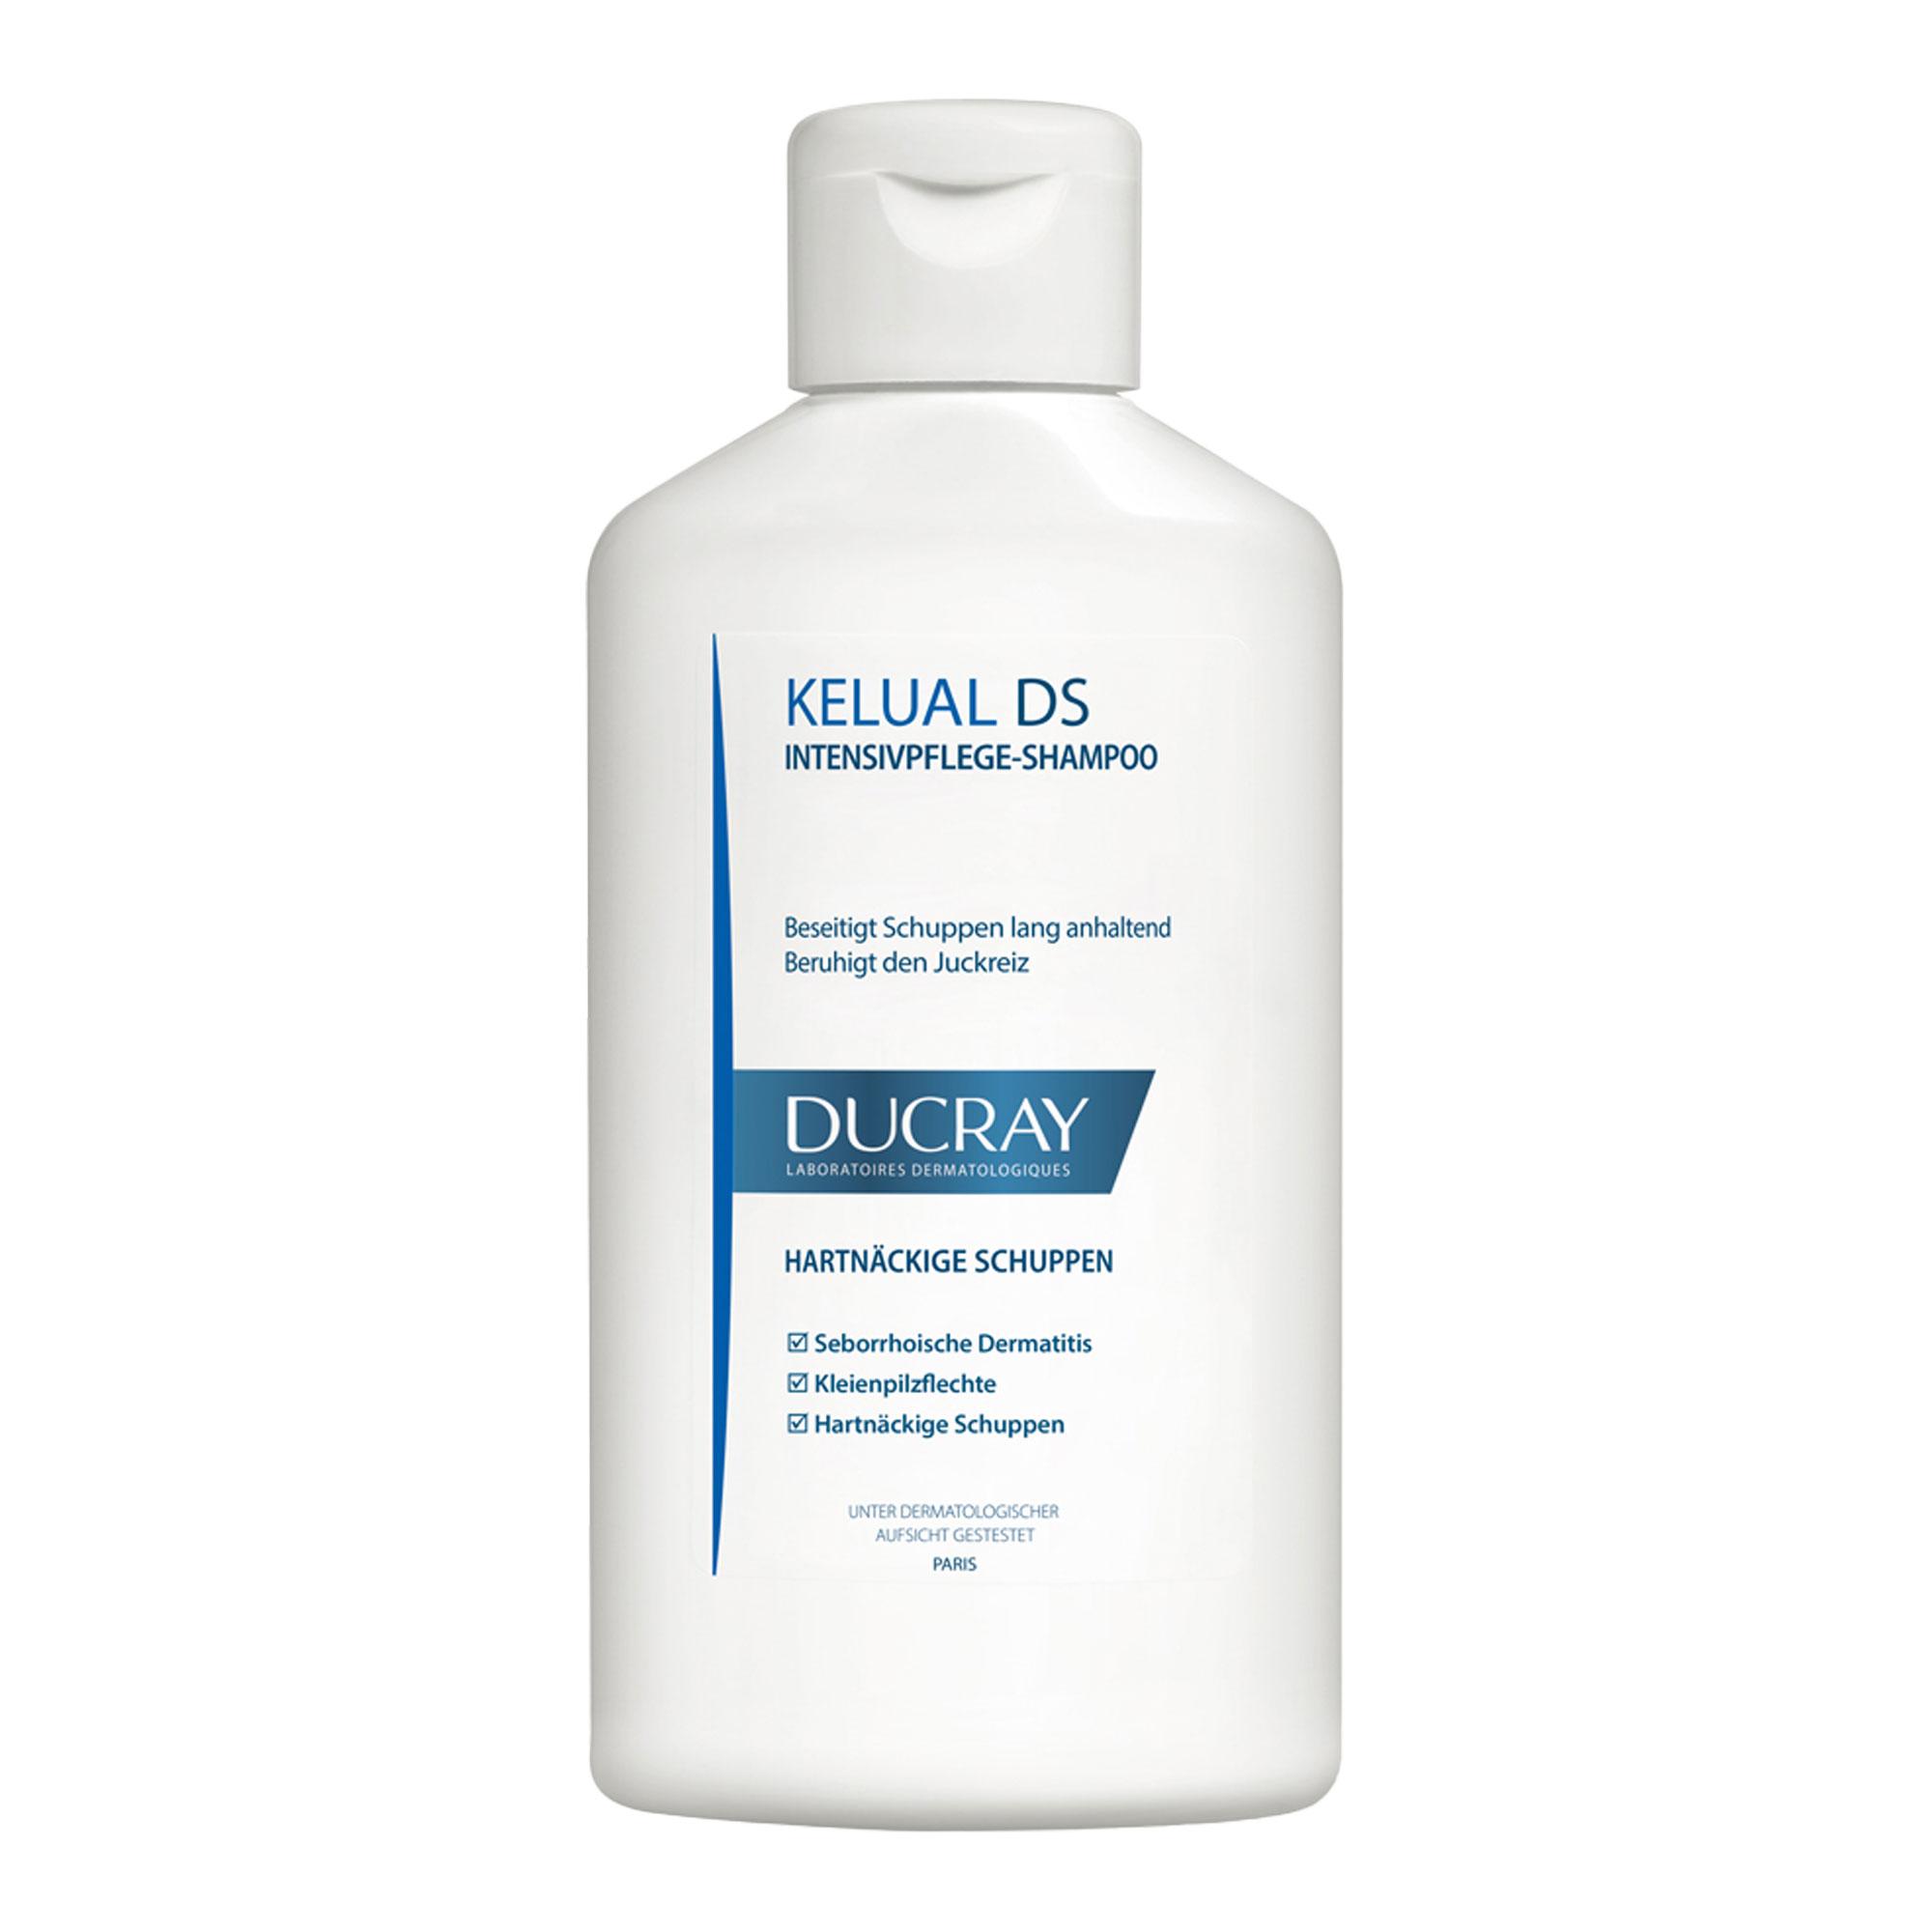 Ducray Kelual DS Anti Schuppen Shampoo